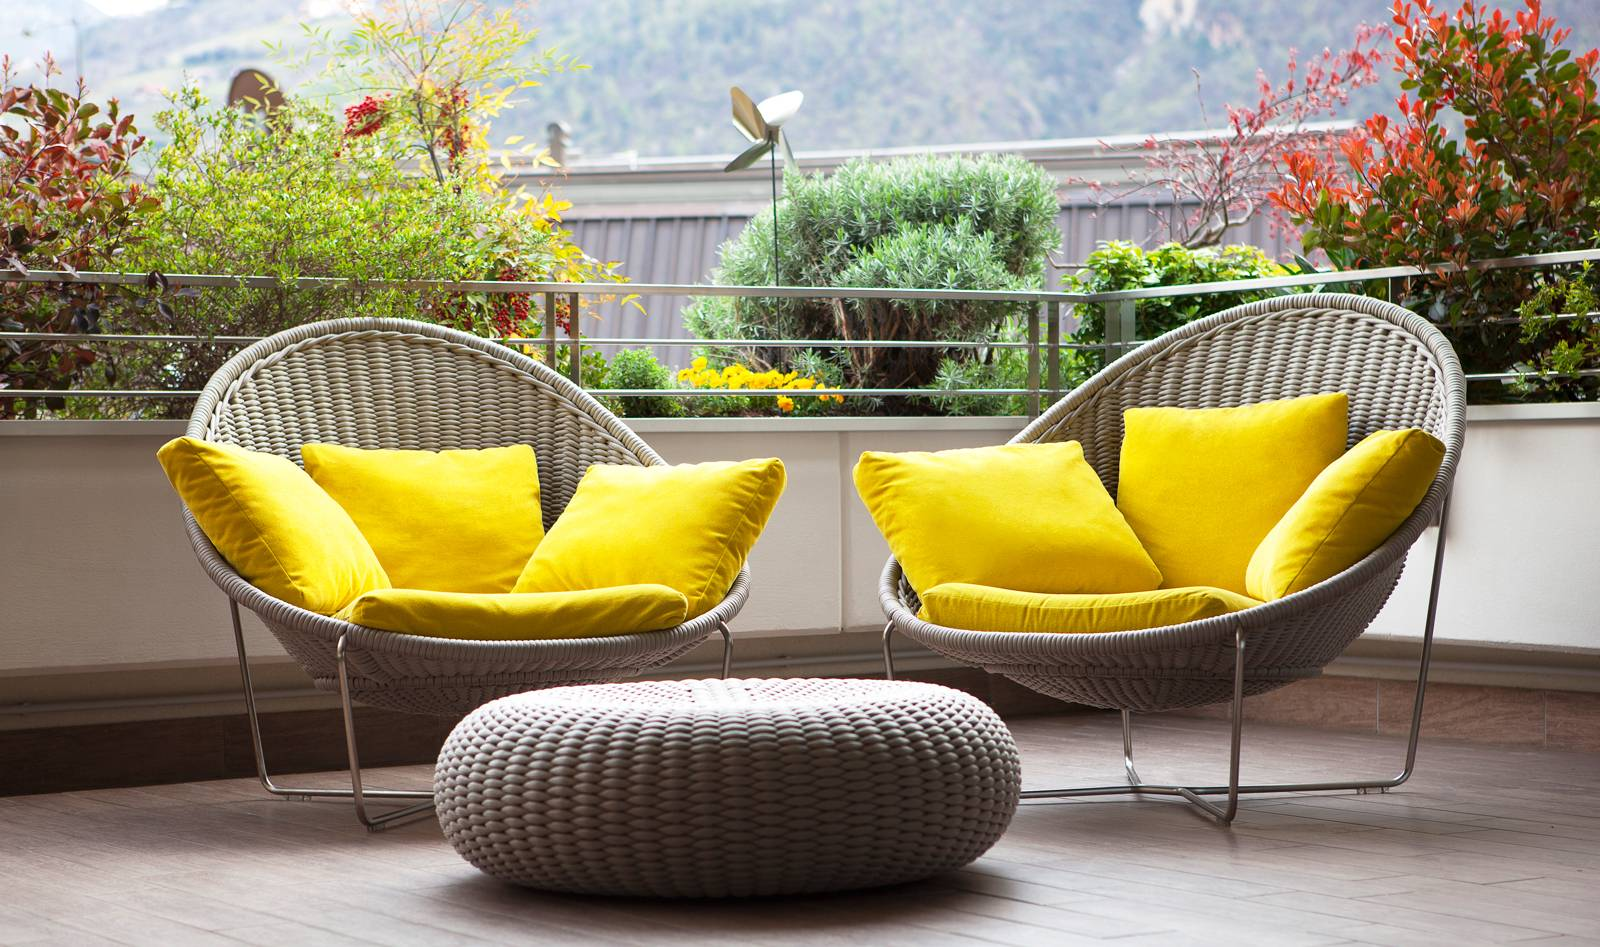 Dise o de planos de apartamento e interior construye hogar for Sillones para departamentos pequenos